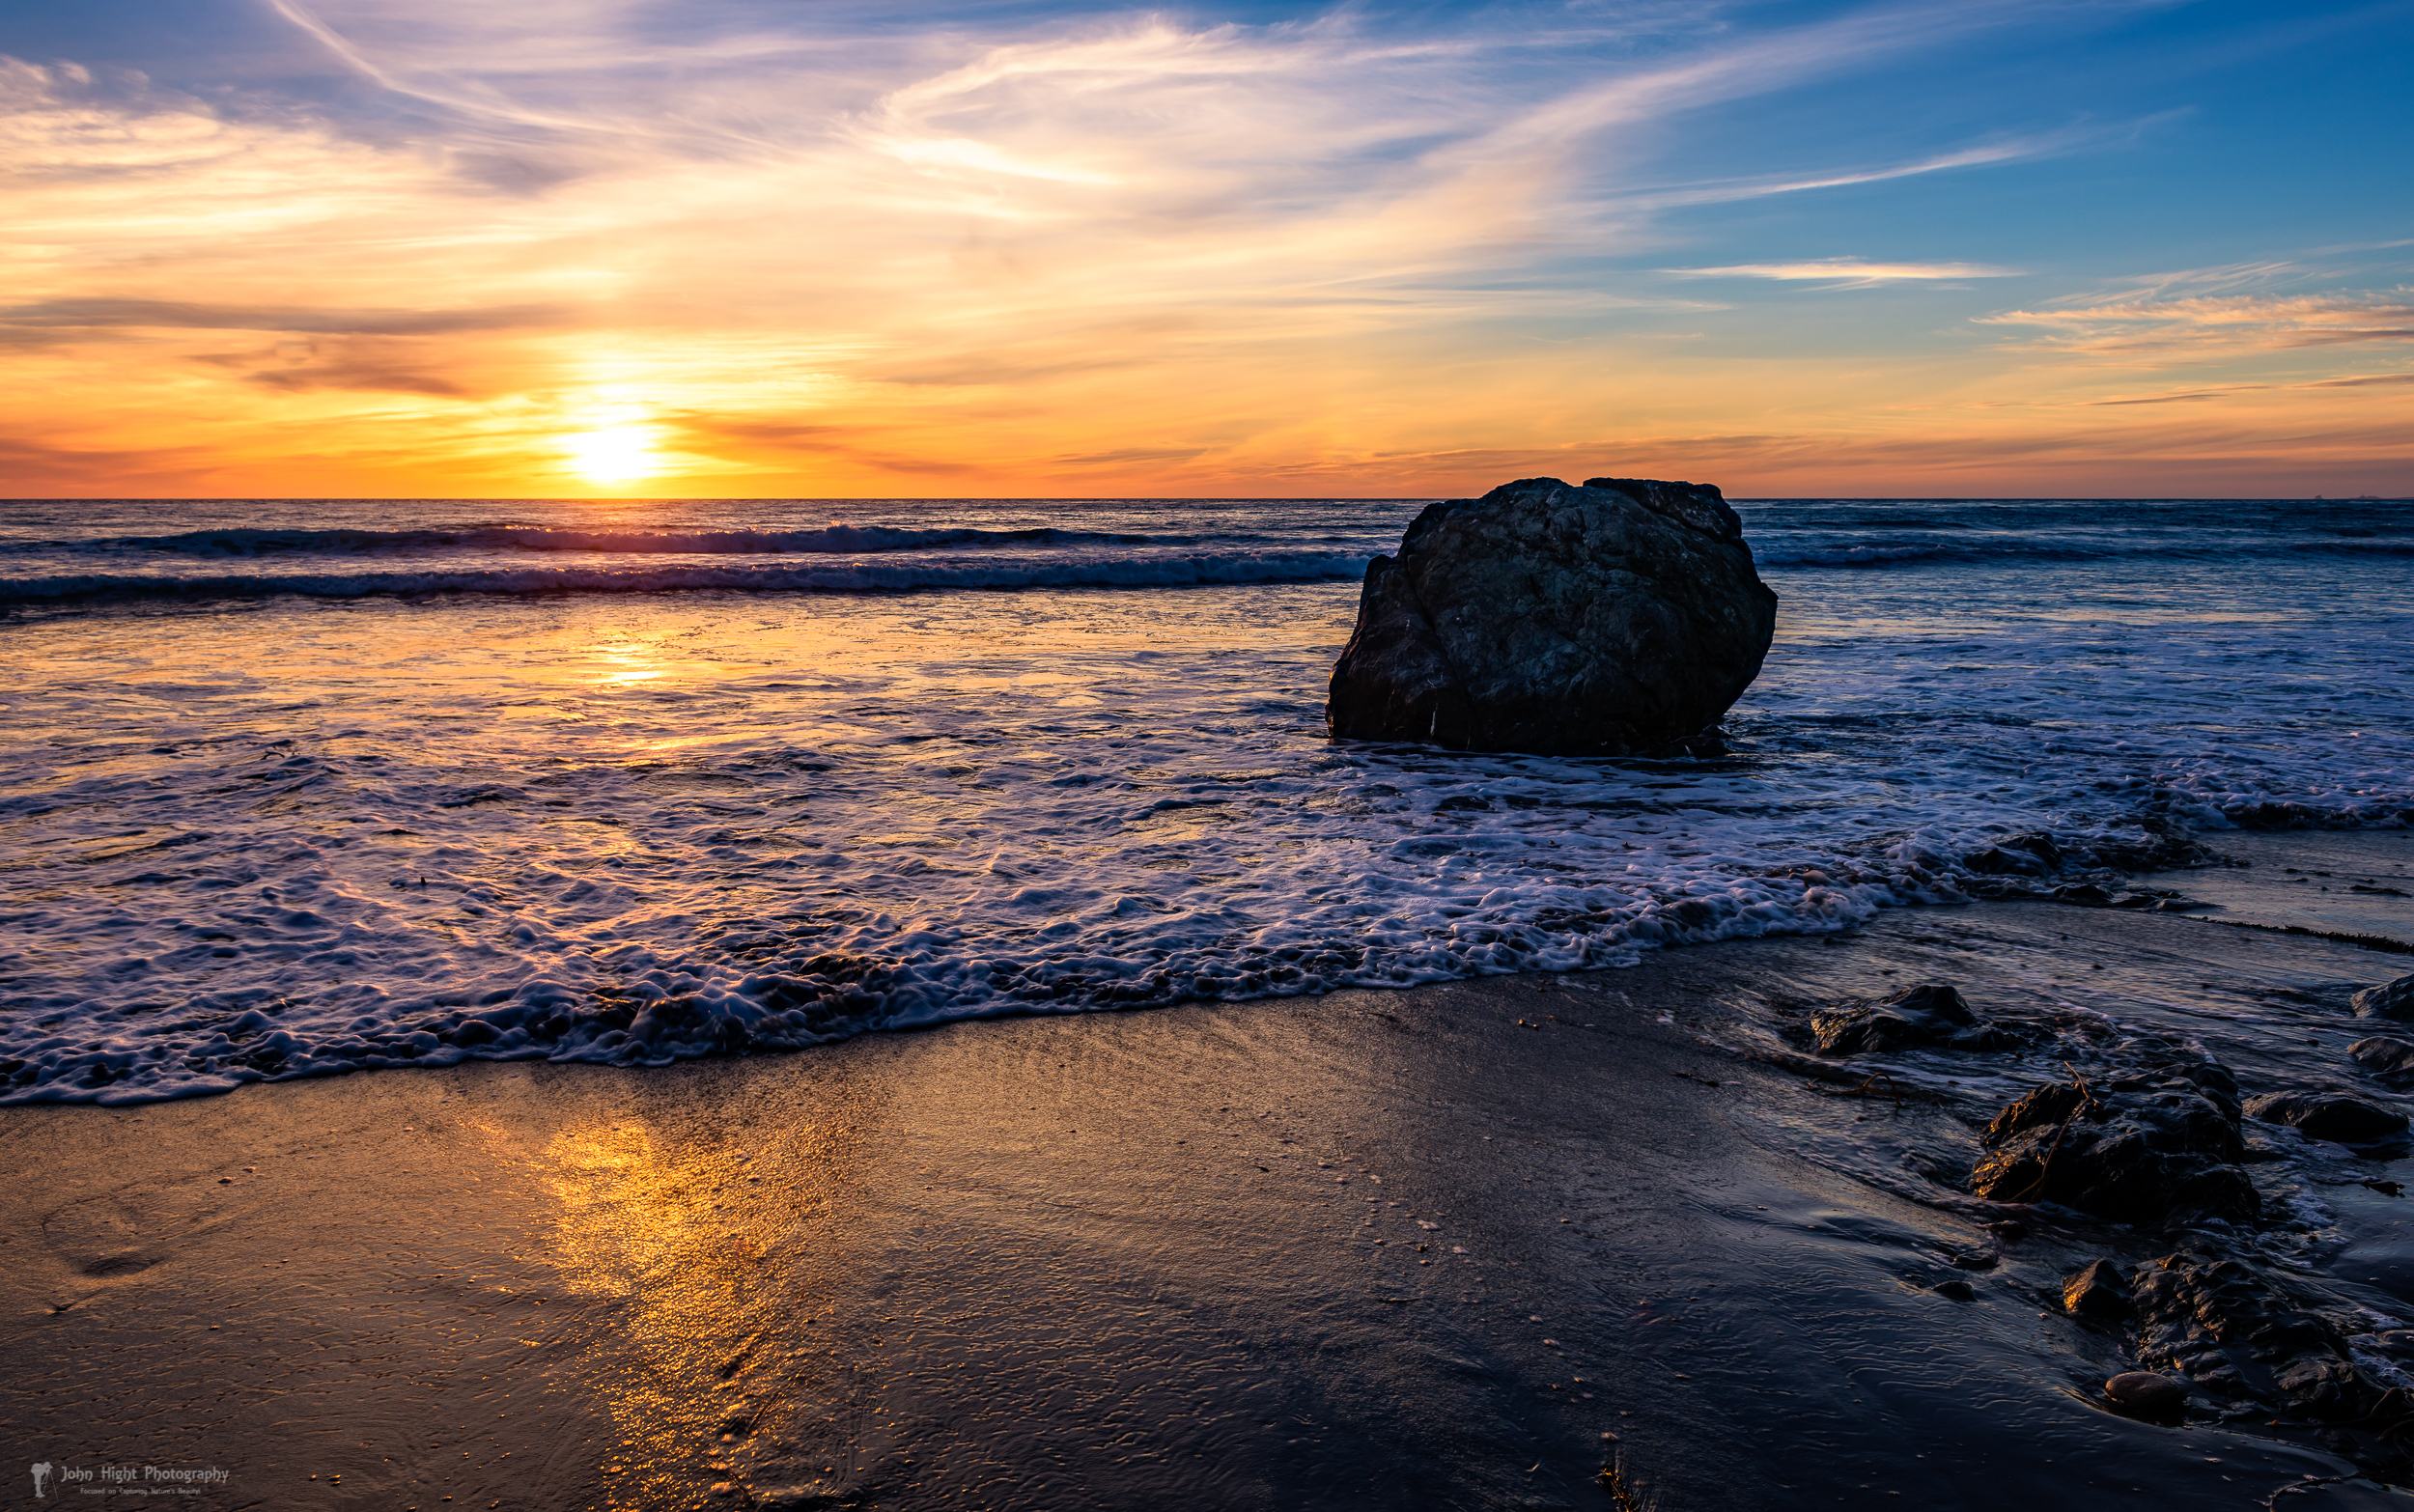 Sunset at San Simeon Beach